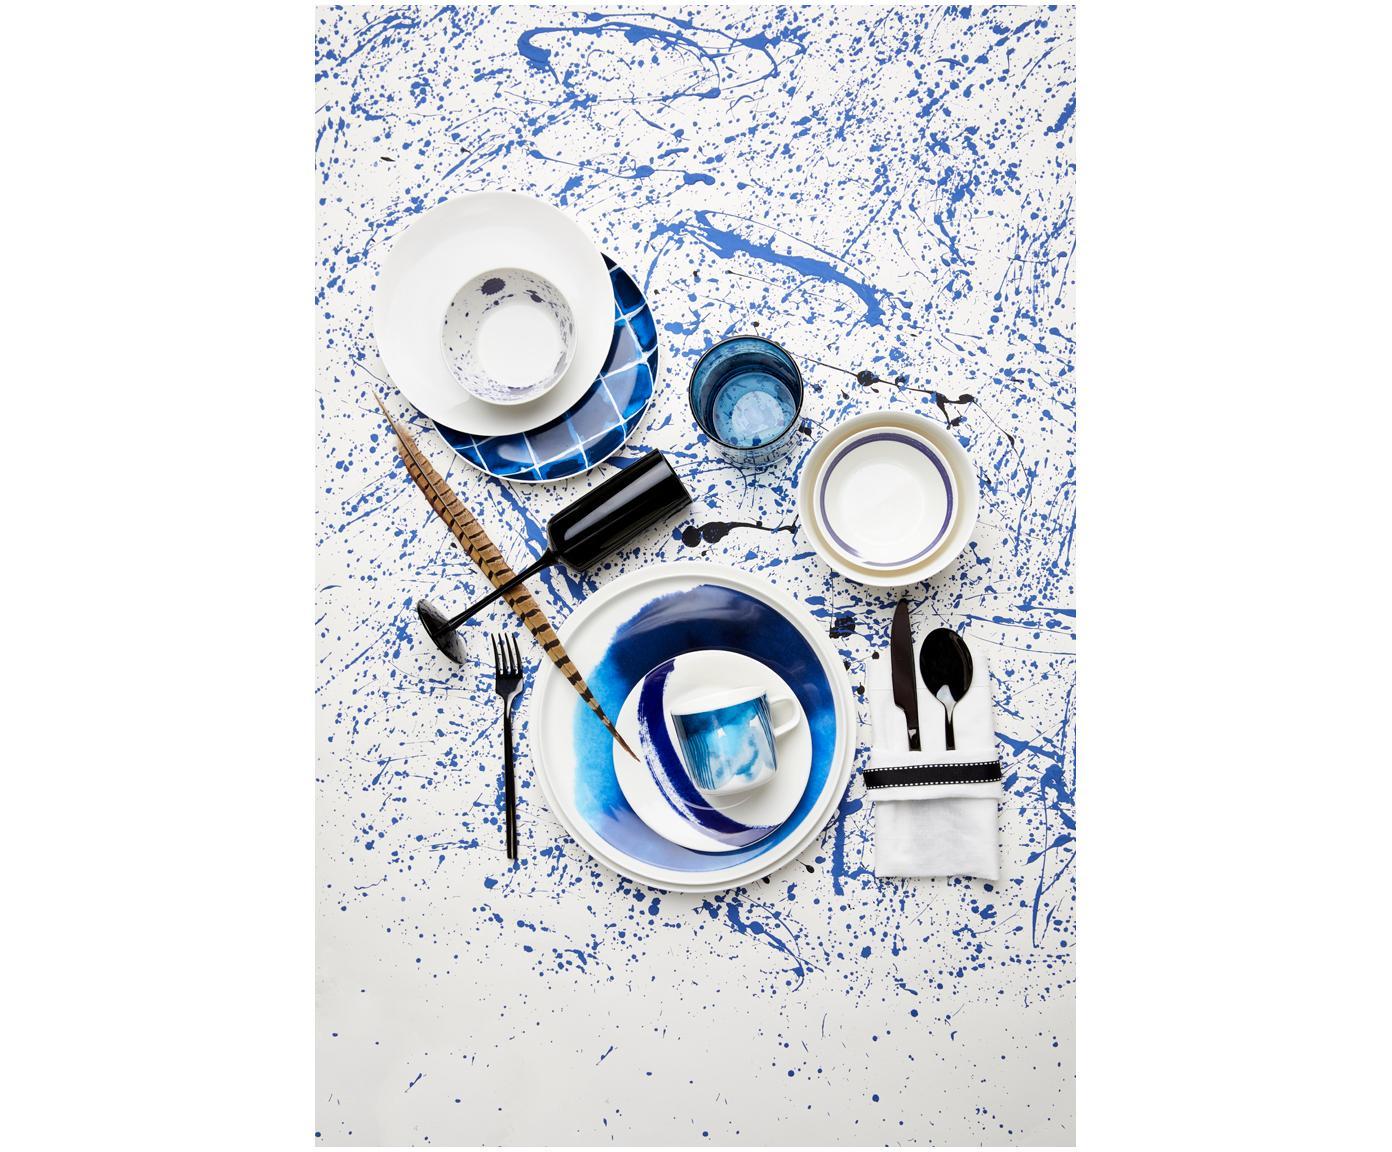 Set 6 piatti per pane Pacific, Porcellana, Bianco, blu pacifico, Ø 16 cm